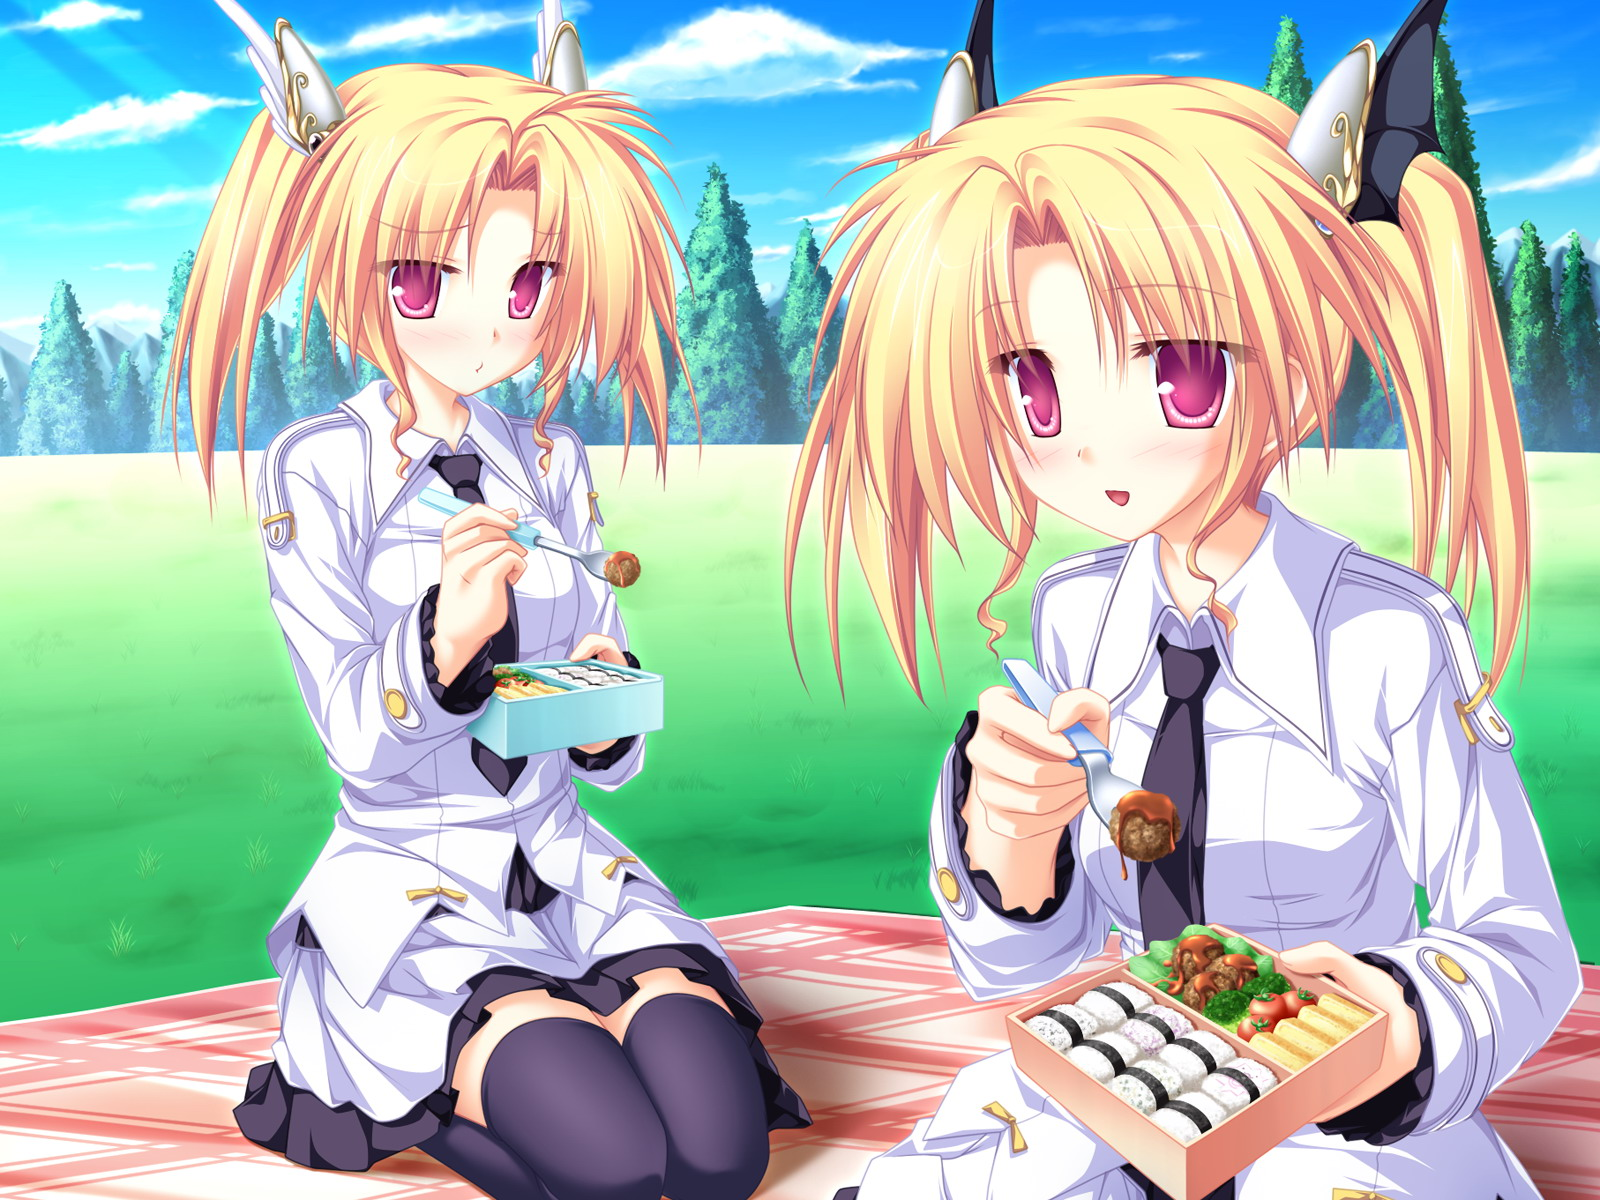 blonde_hair food game_cg grass magus_tale nina_geminis rena_geminis school_uniform sky tenmaso thighhighs tree twins twintails whirlpool